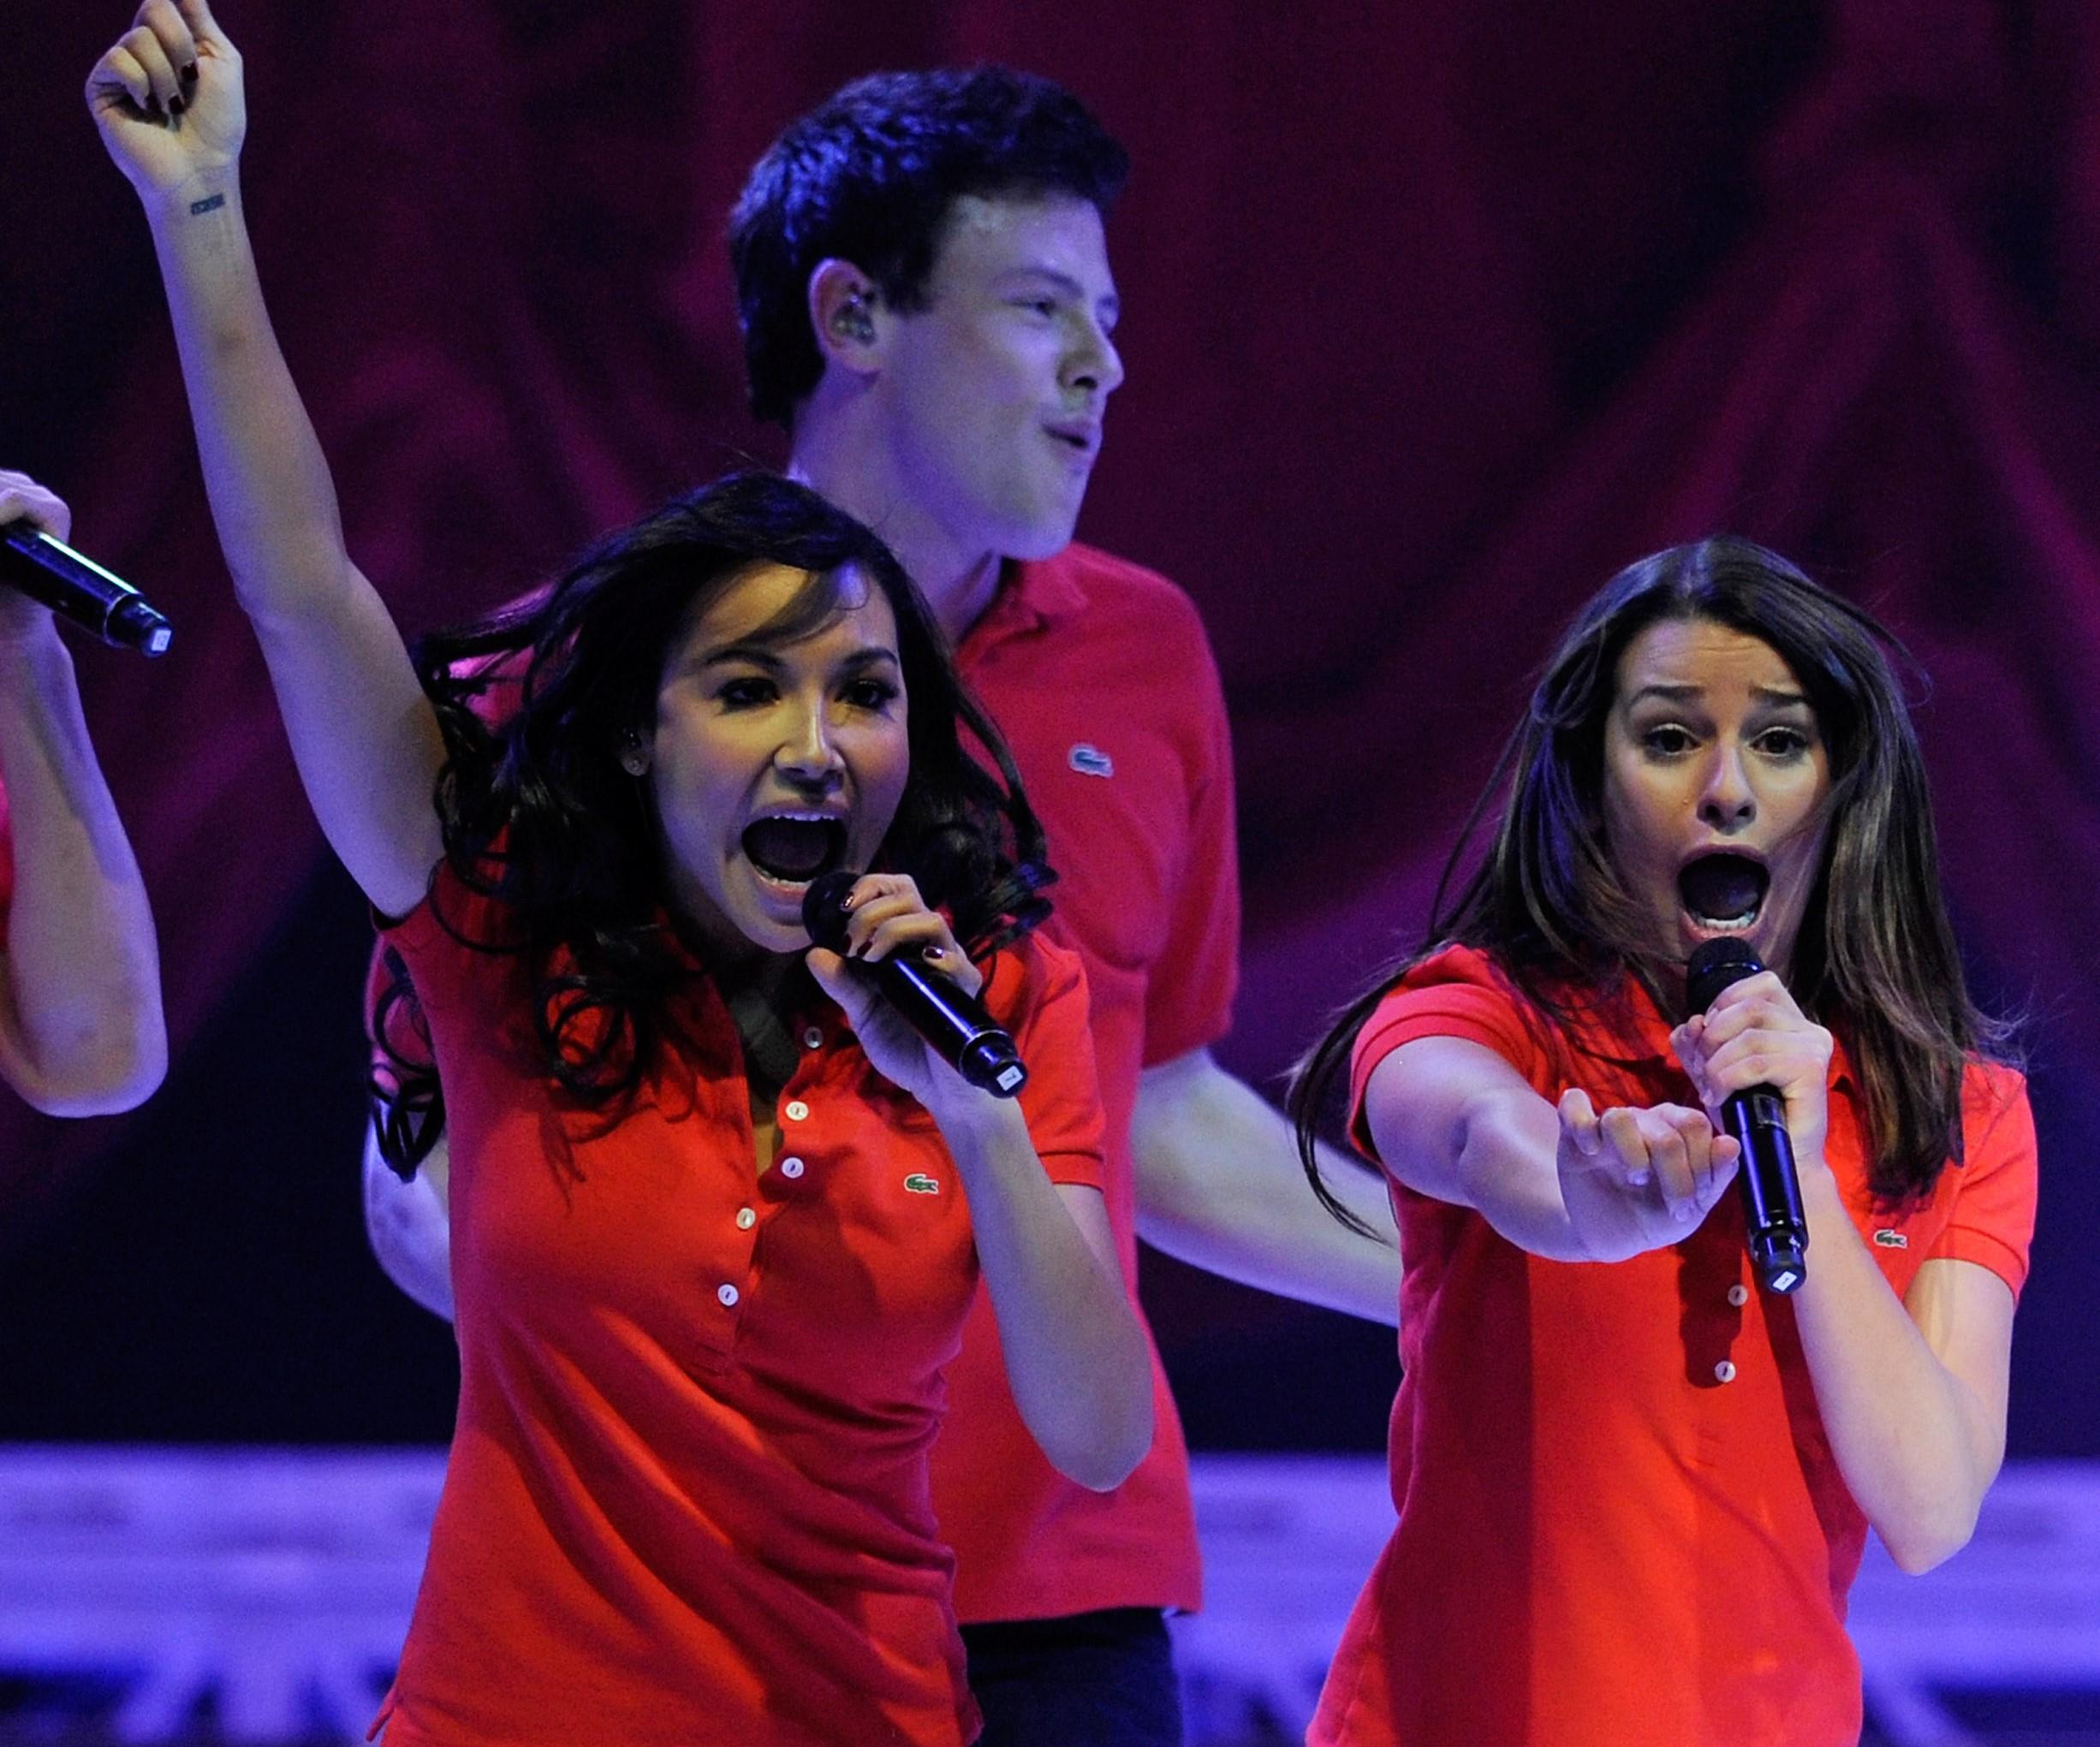 Naya Rivera e Lea Michele cantando durante turnê de Glee